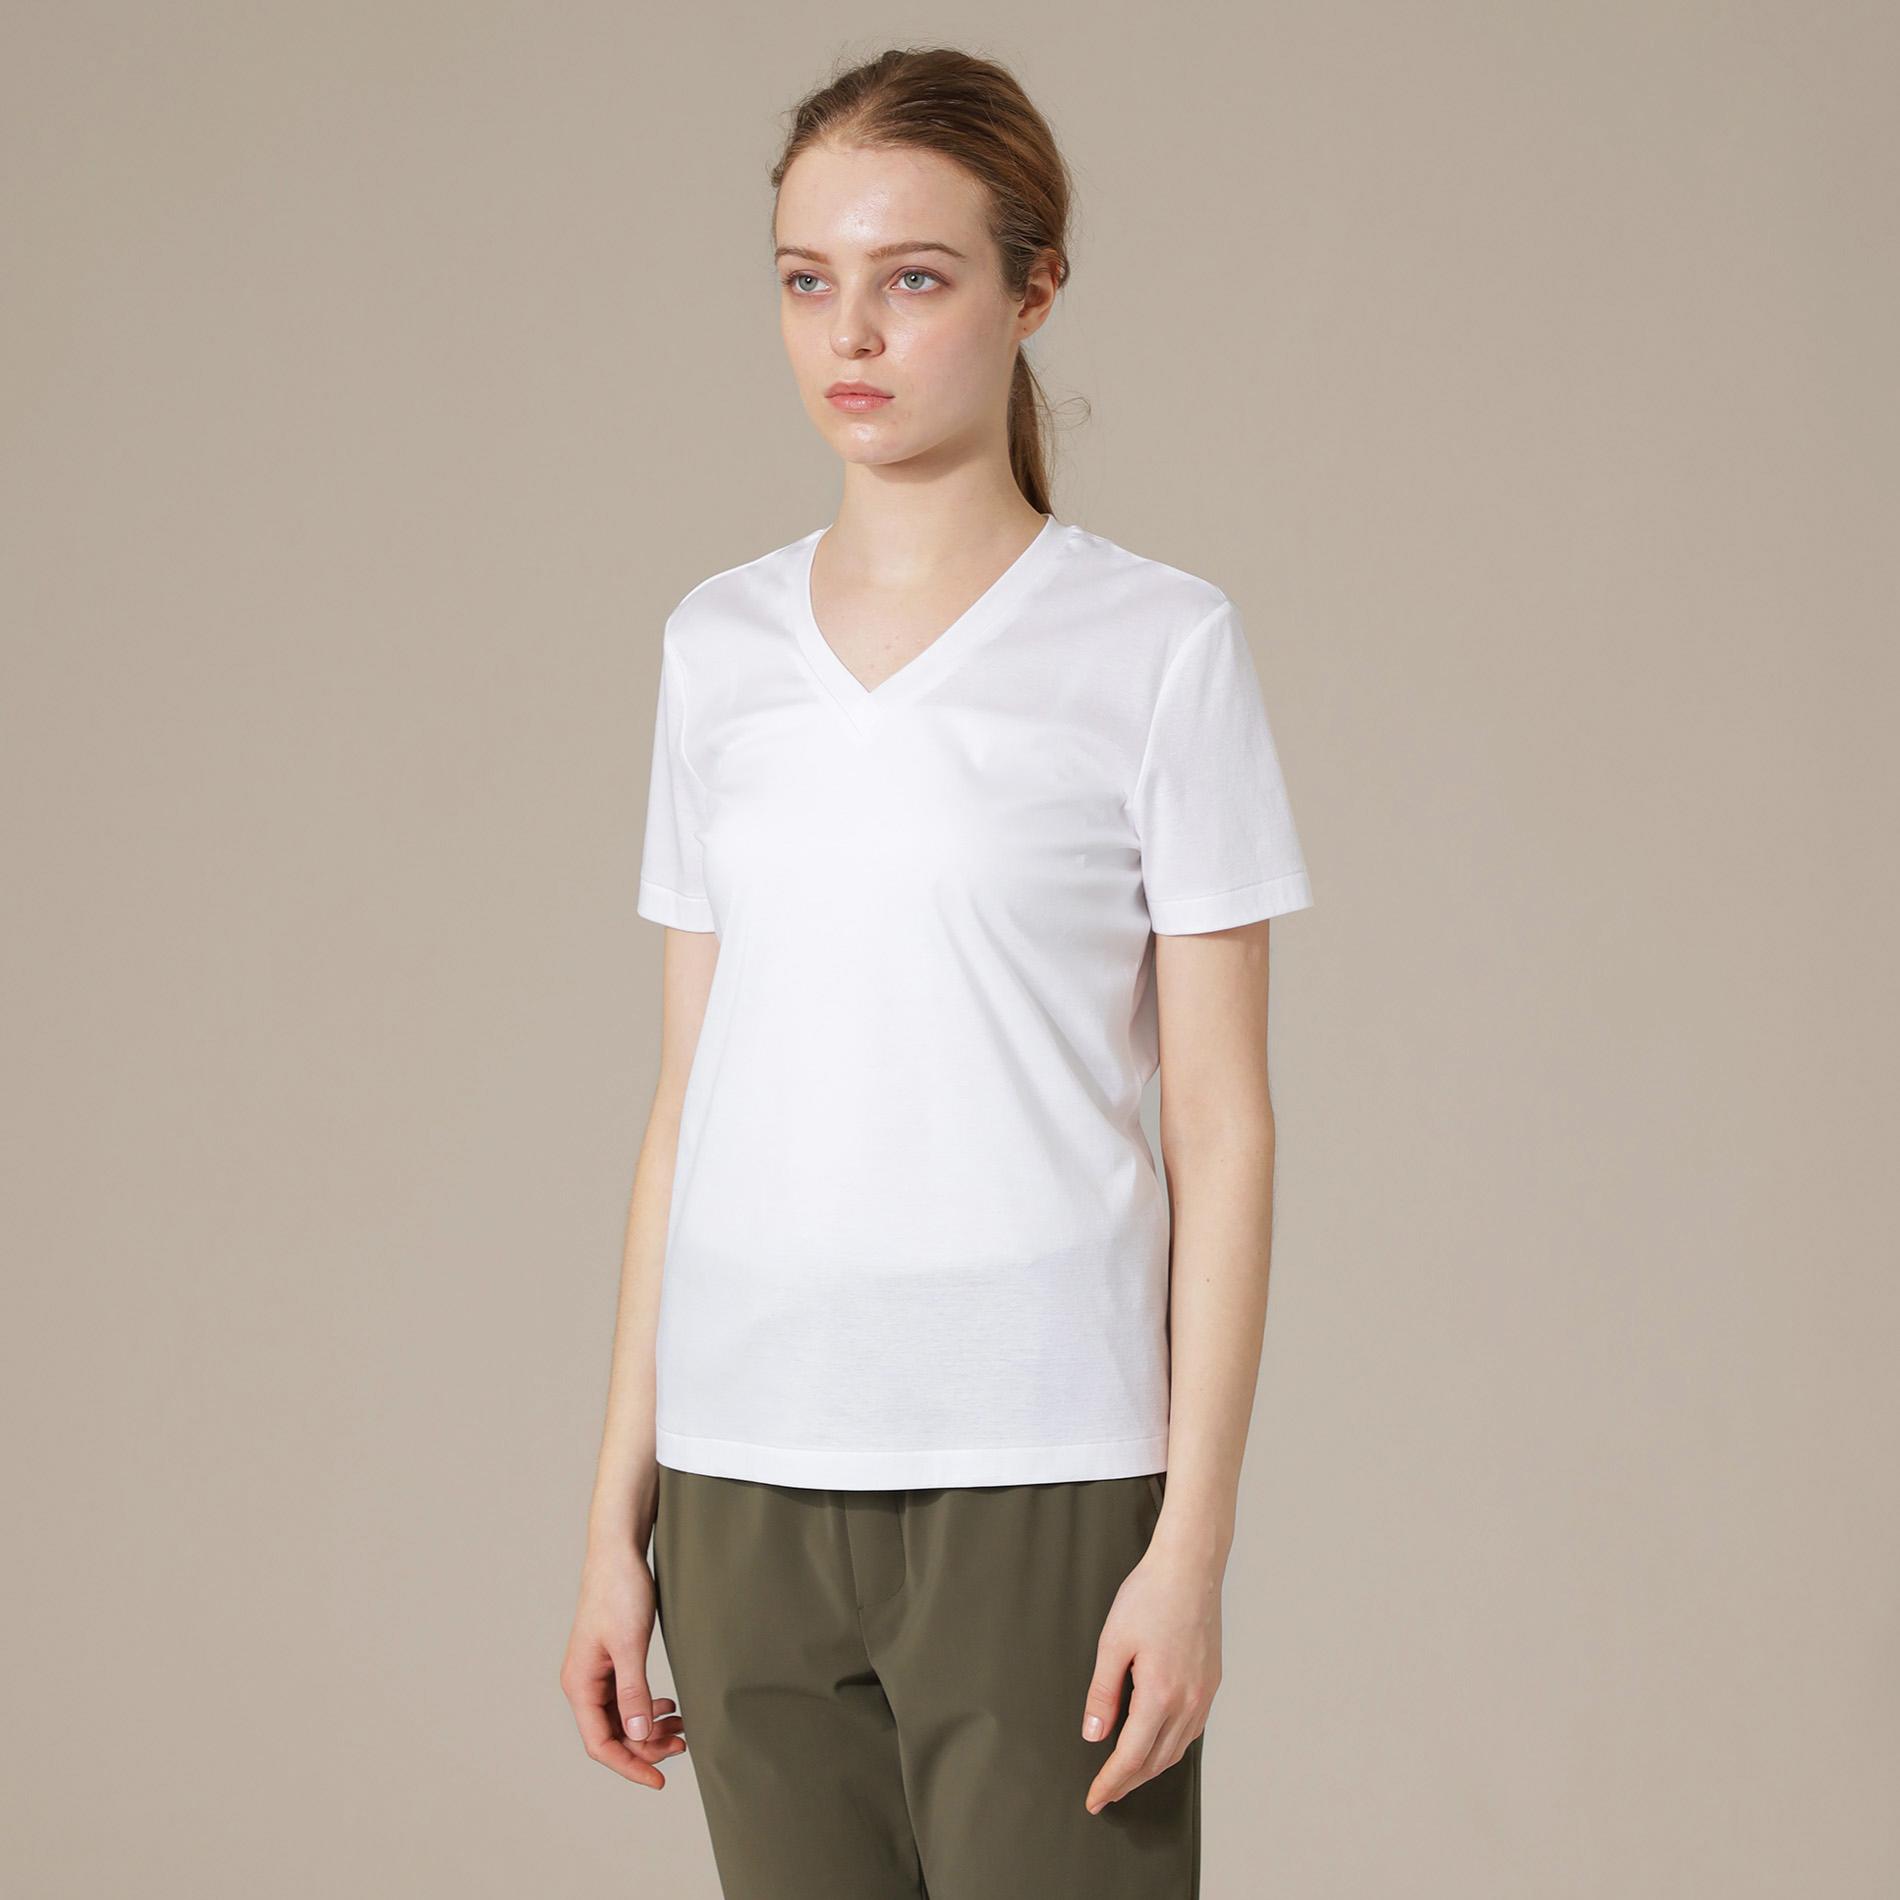 ◆◆【The Essential Collection】スーピマコットンVネック半袖Tシャツ